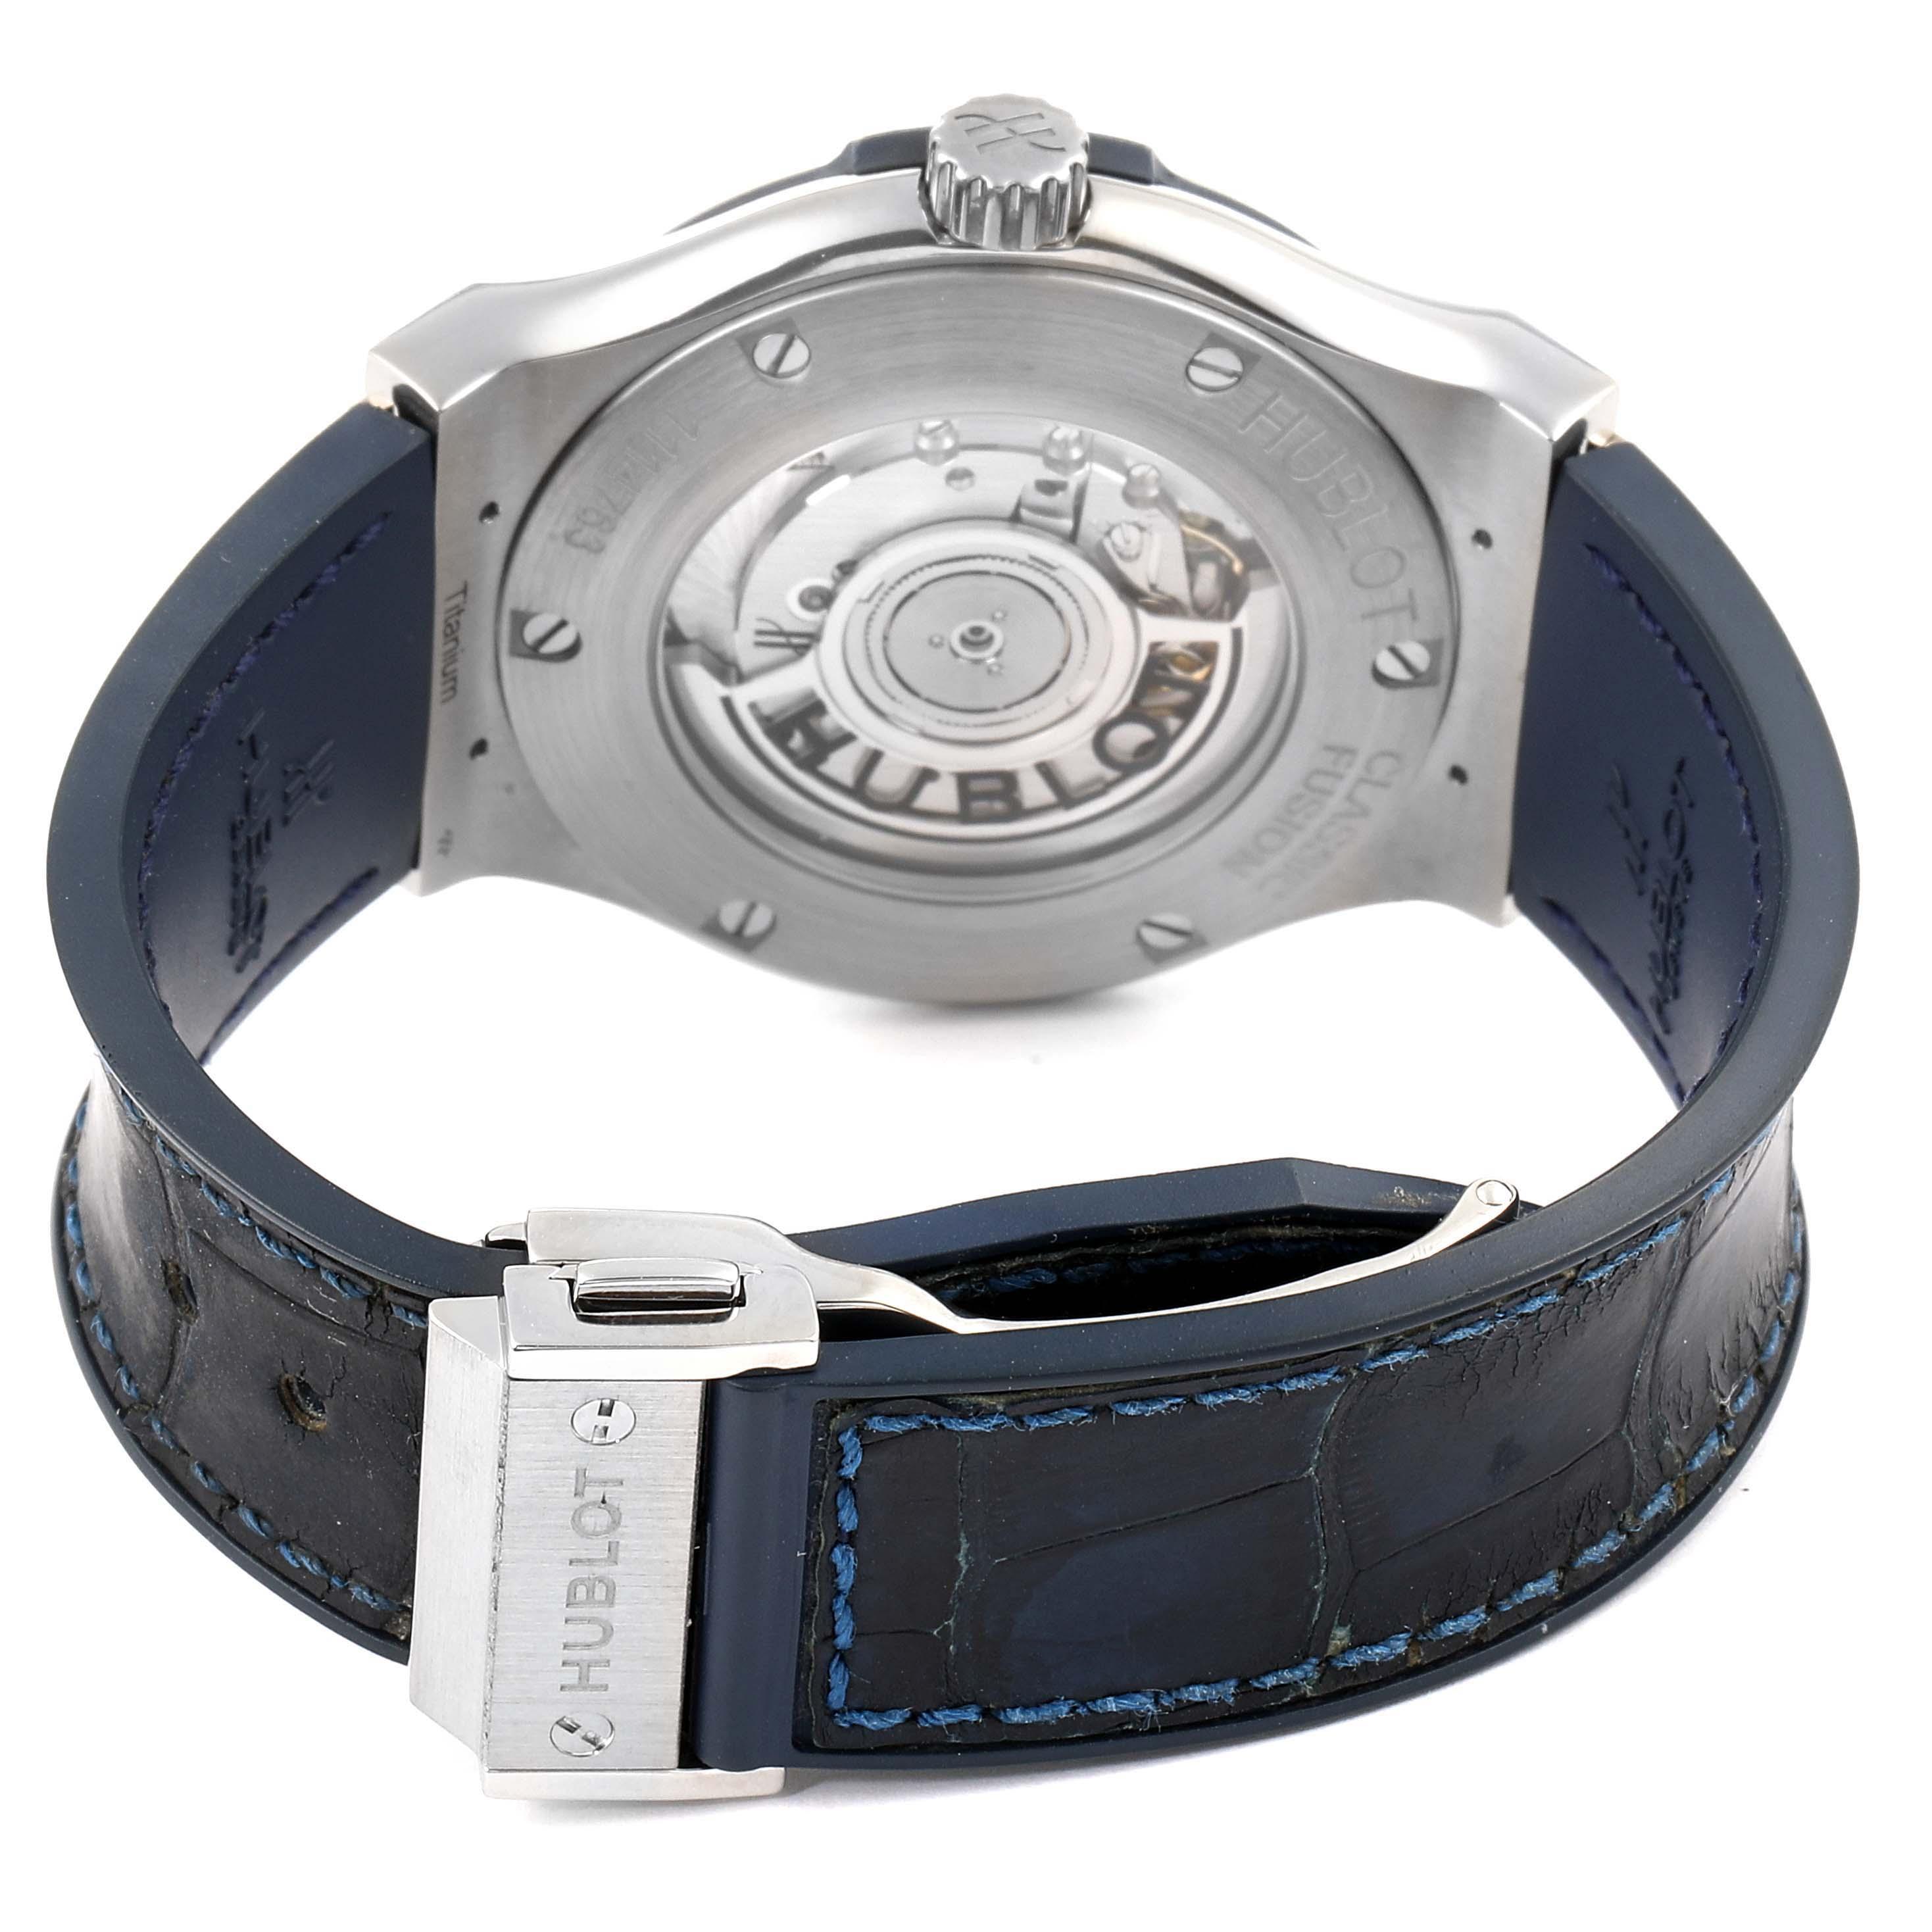 Hublot Classic Fusion Titanium 42mm Blue Dial Mens Watch 542.NX.7170.LR SwissWatchExpo